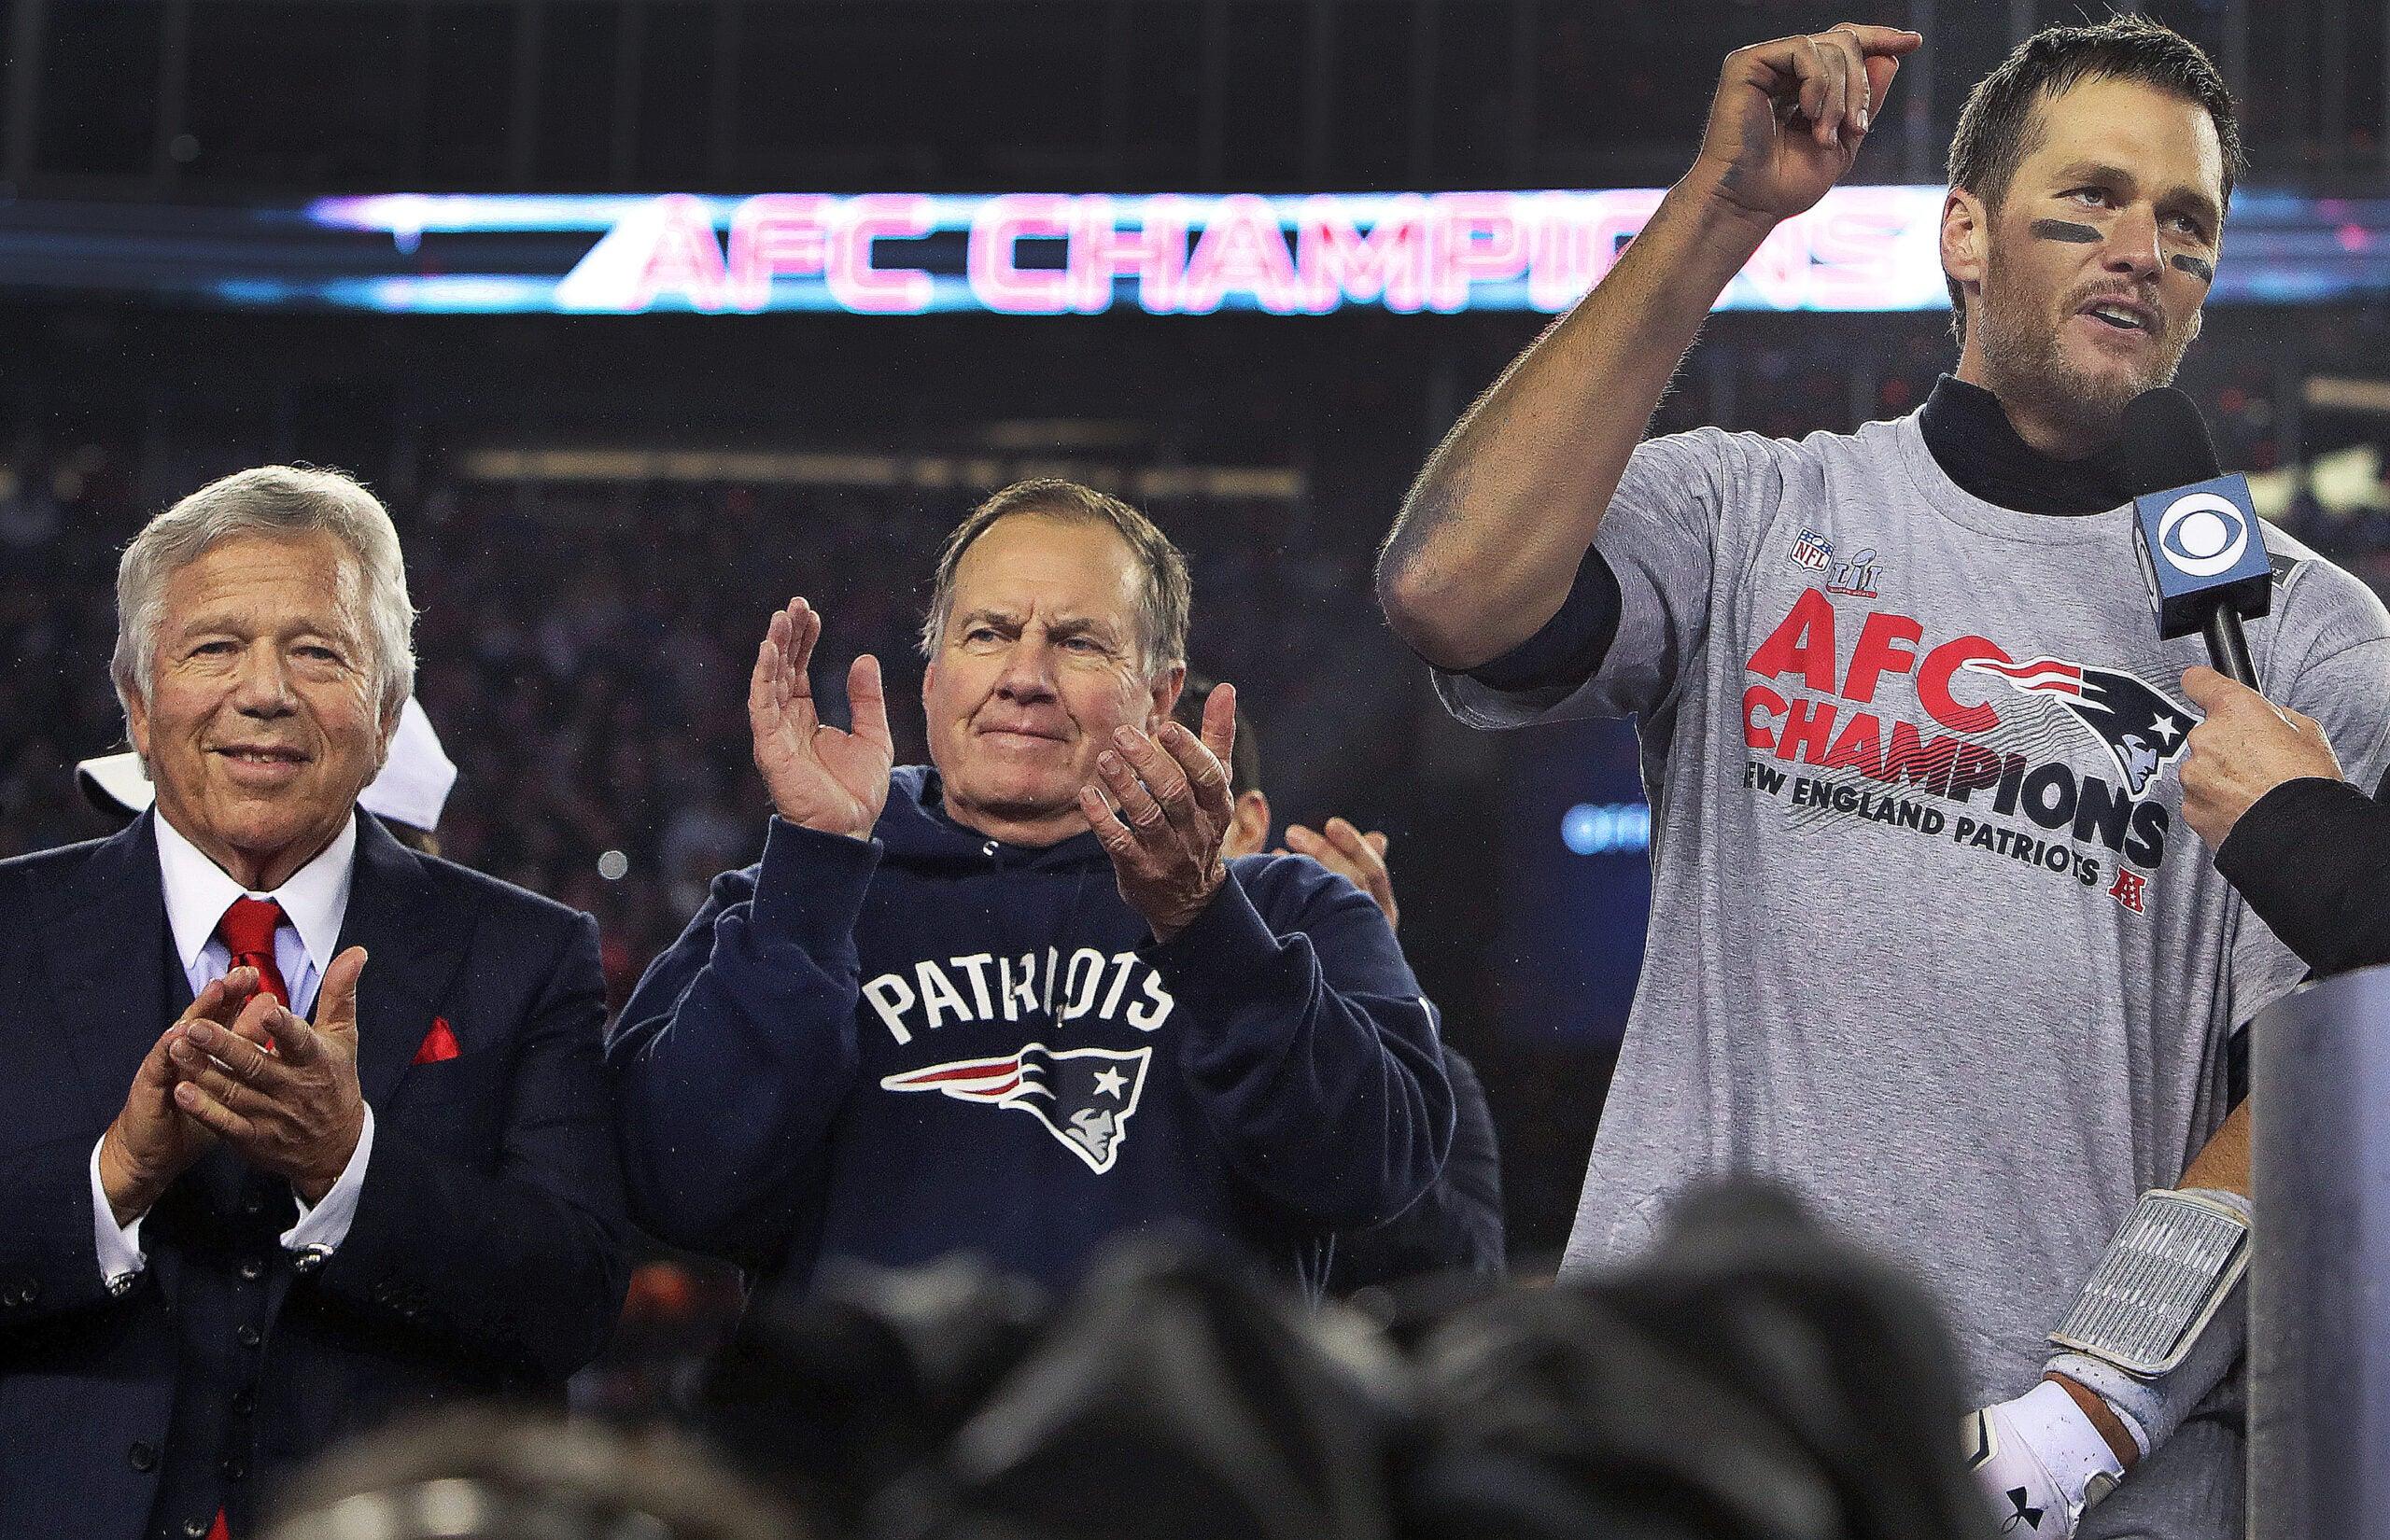 Patriots dynasty